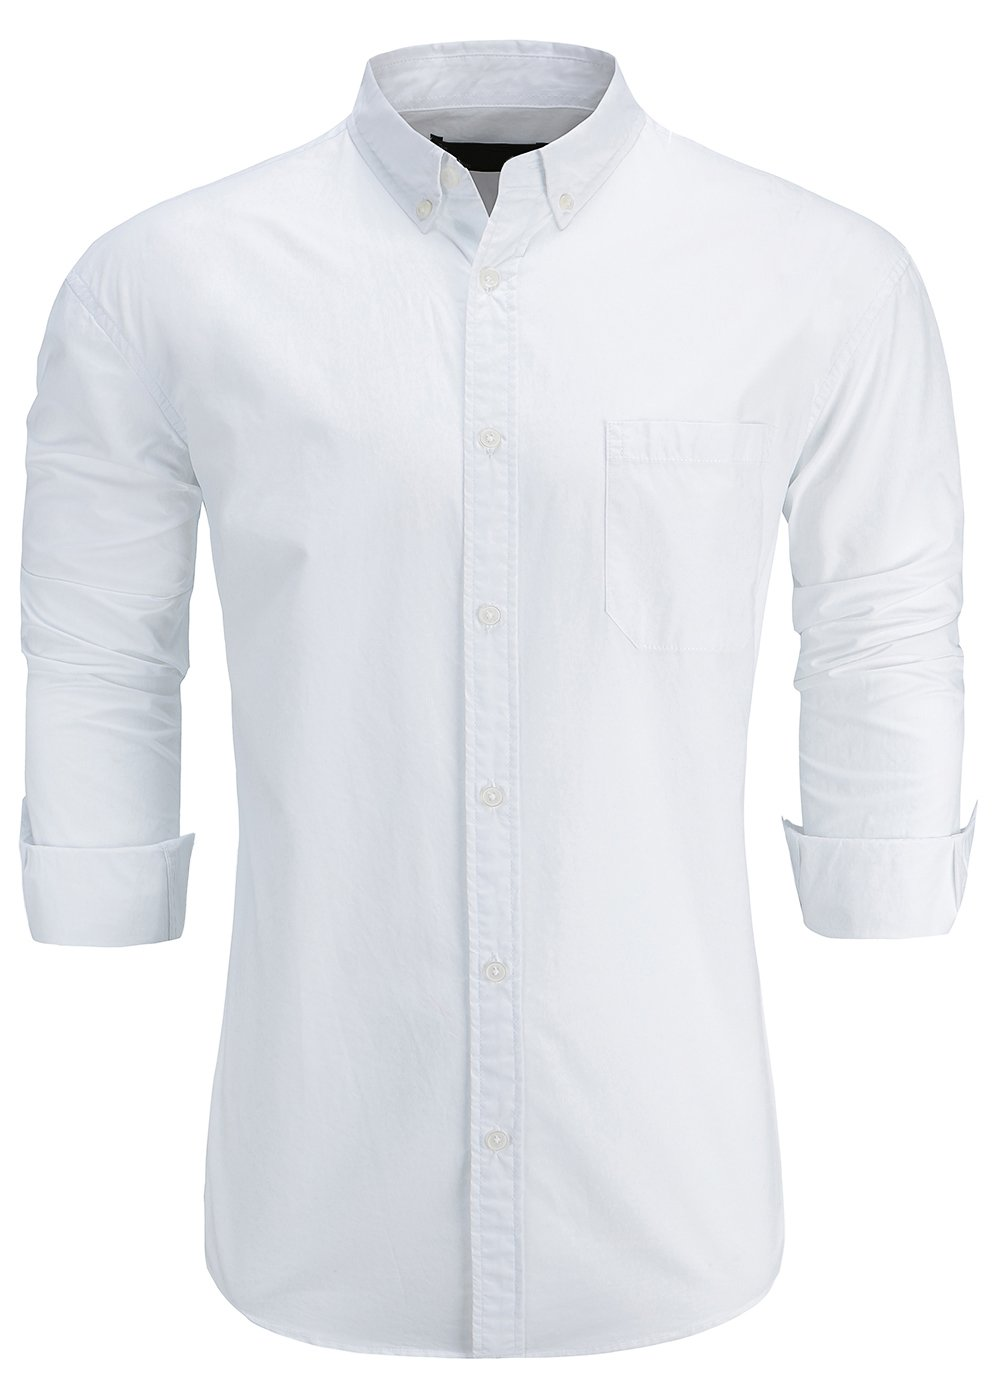 KateSui Men's 100% Cotton Slim Fit Long Sleeve Button-Down Oxford Dress Shirt Medium White